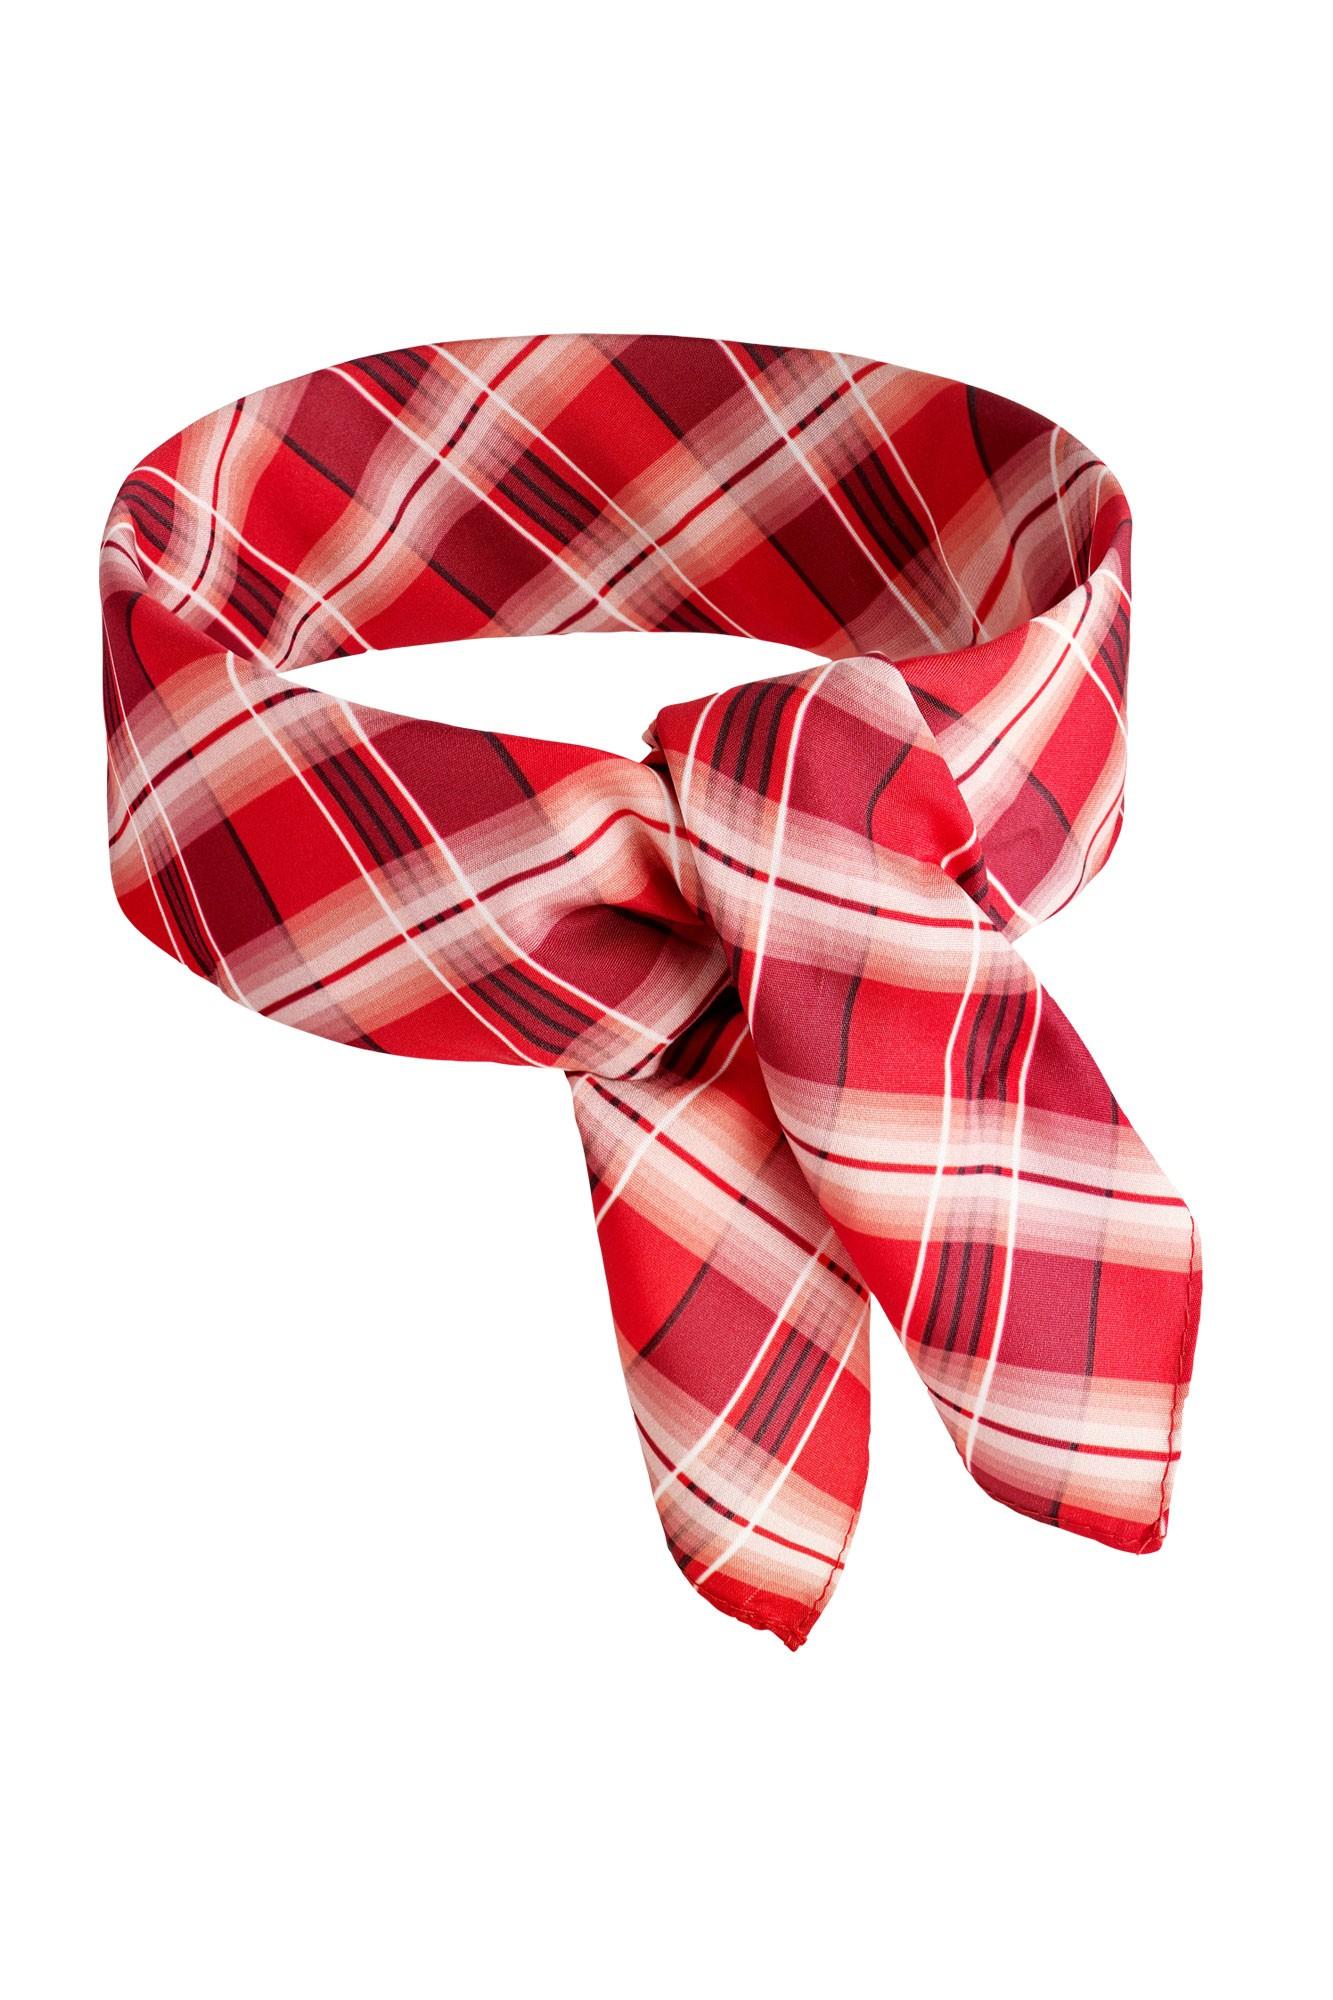 Šátek Karostreifen - červený